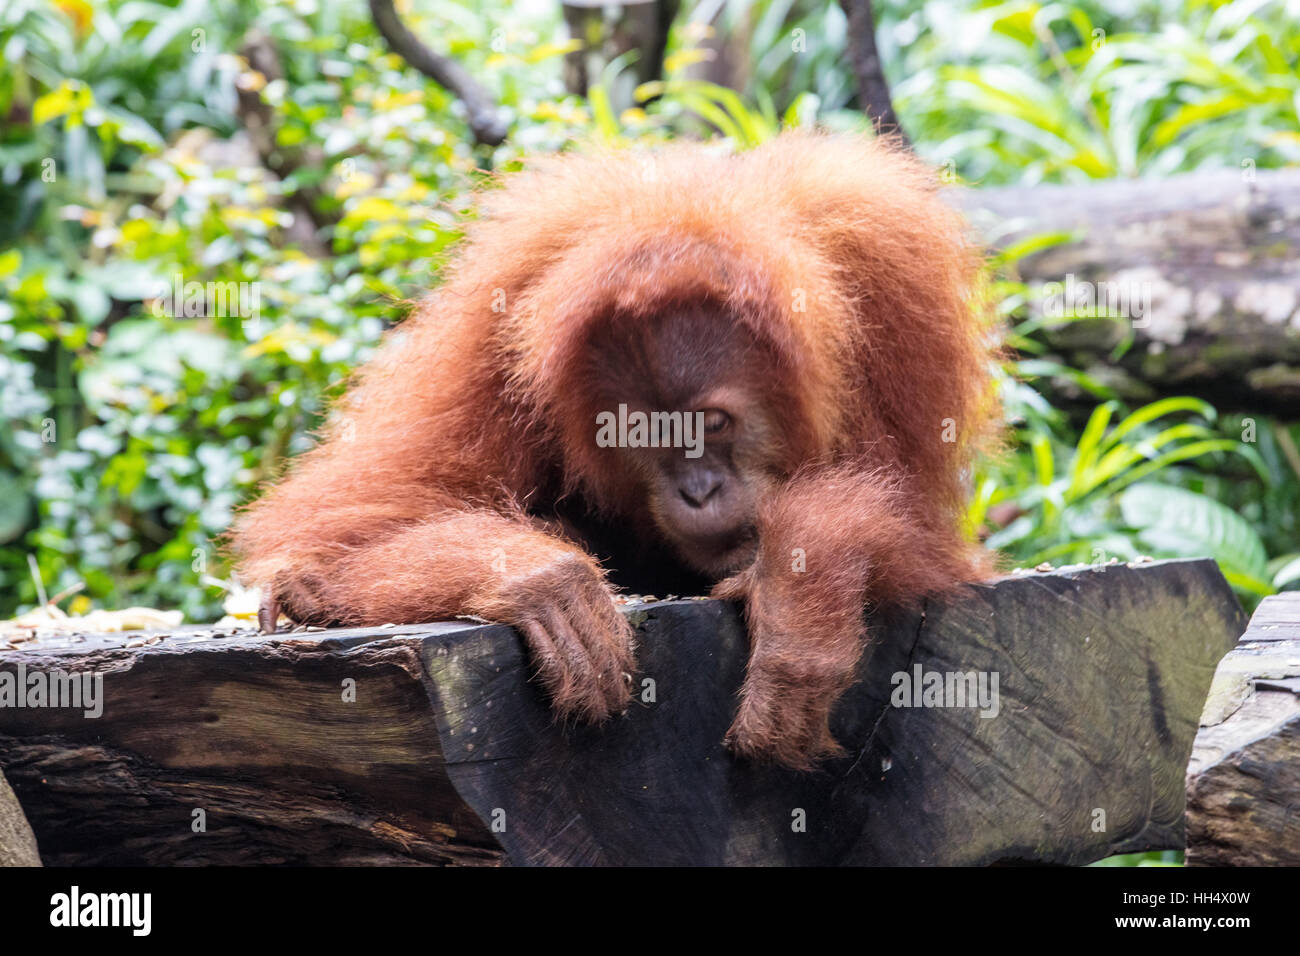 Orangutan sitting on a  branch eating - Stock Image